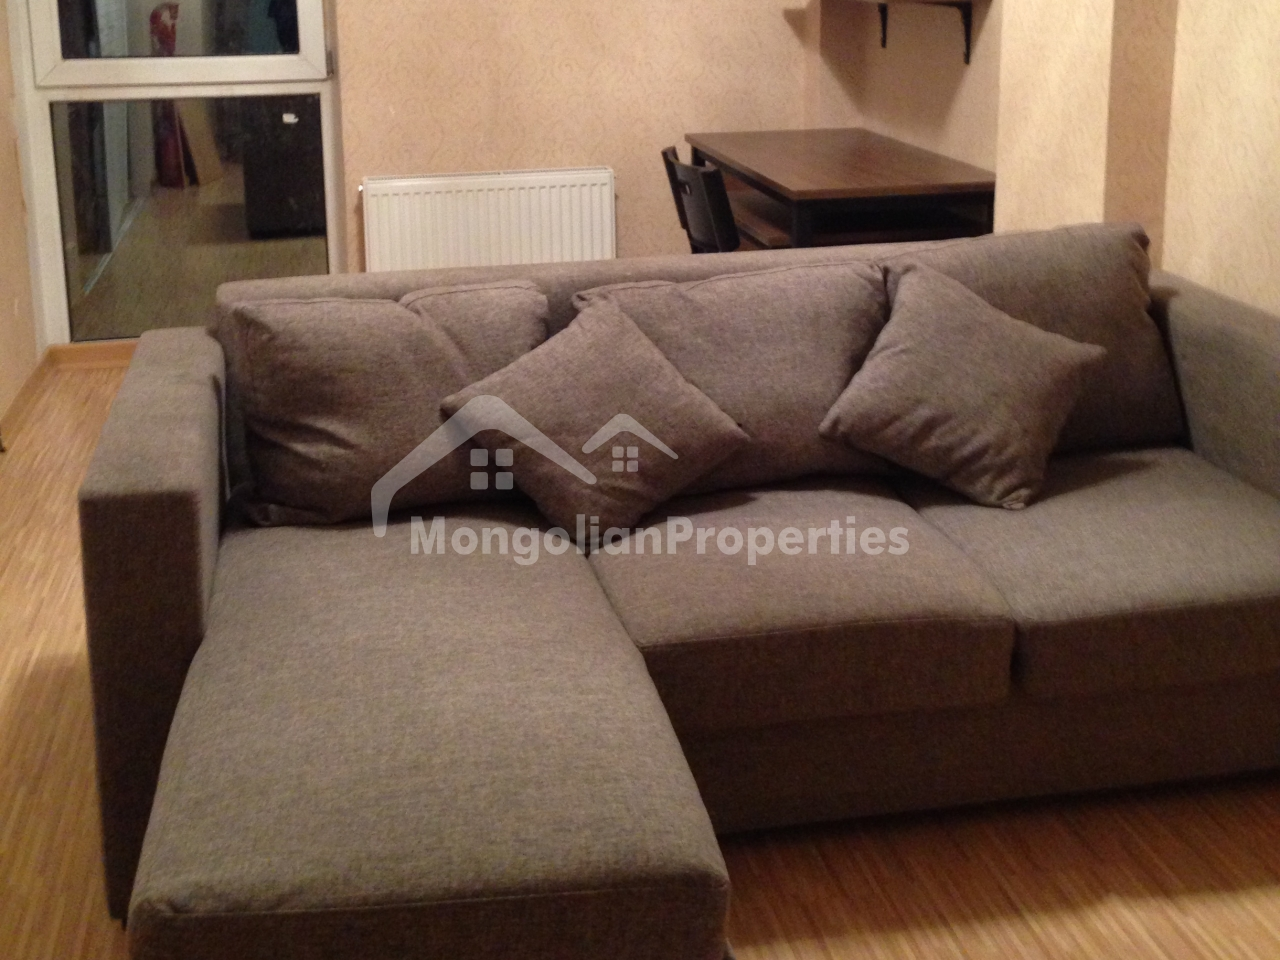 SALE: Viva city 1 single room apartment for sale